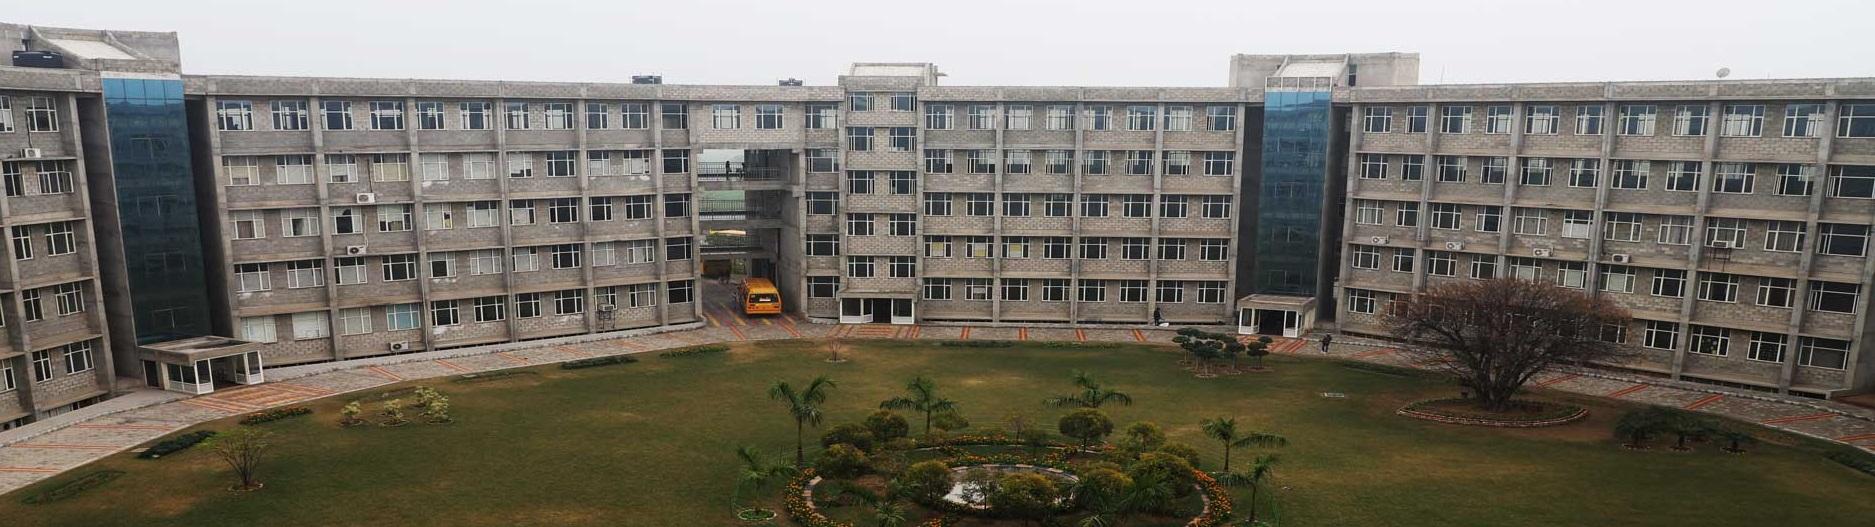 Akal Business School, Akal University, Bathinda Image